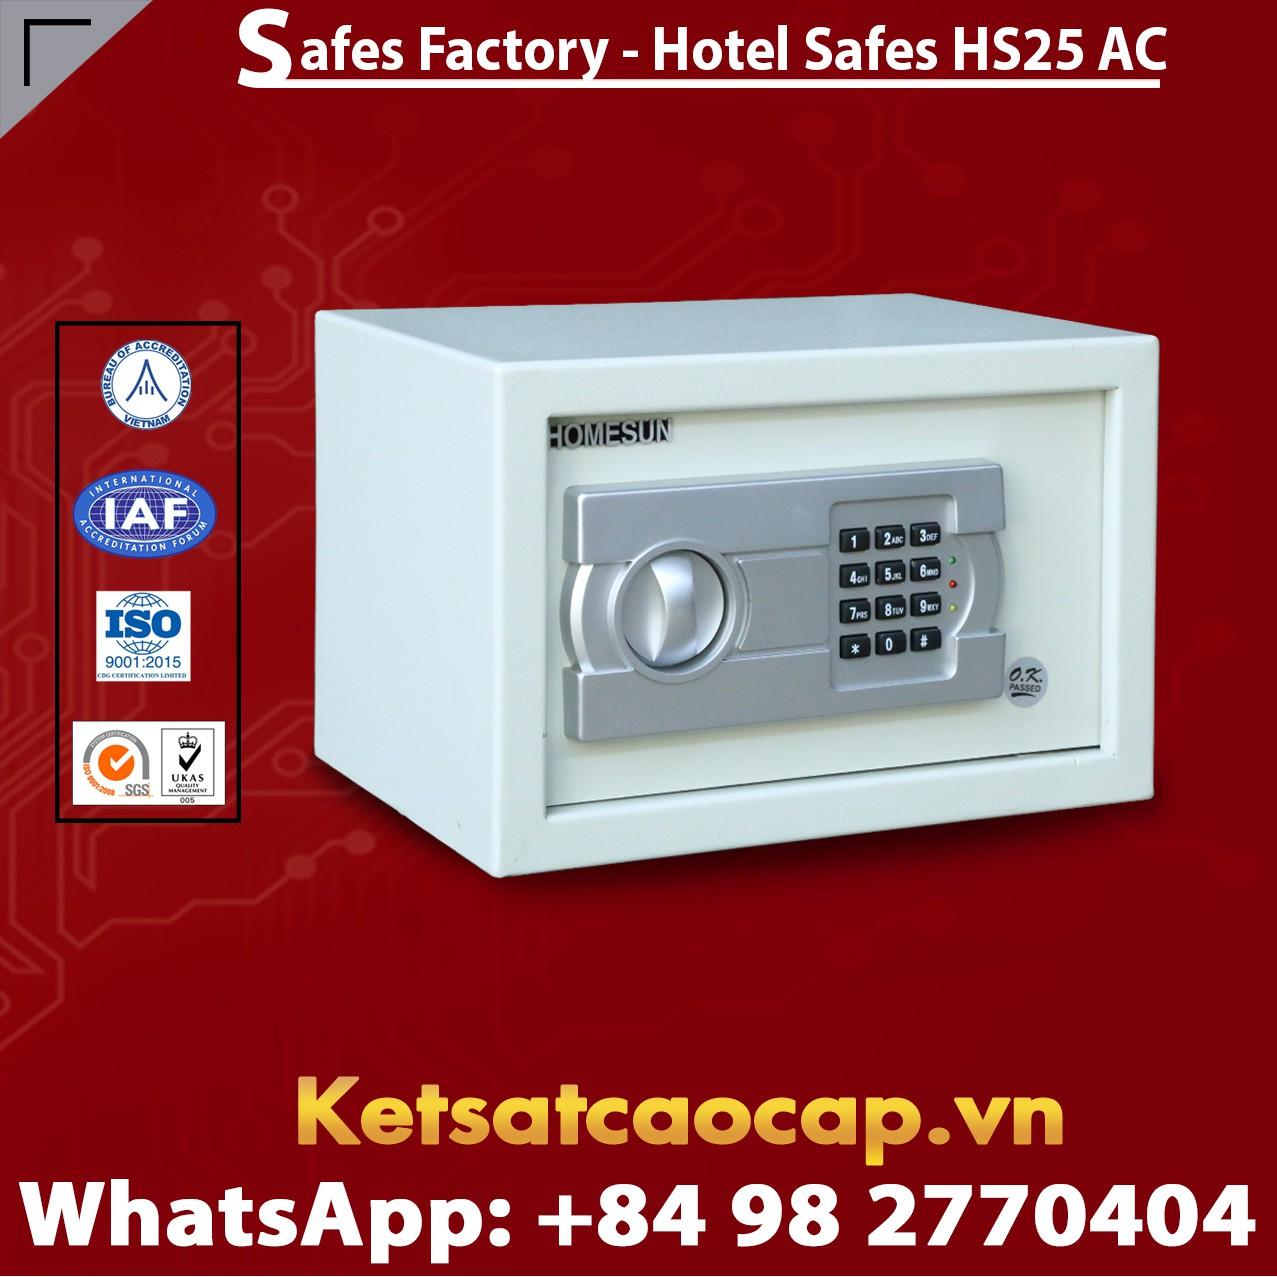 Hotel Safes HOMESUN HS25 AC